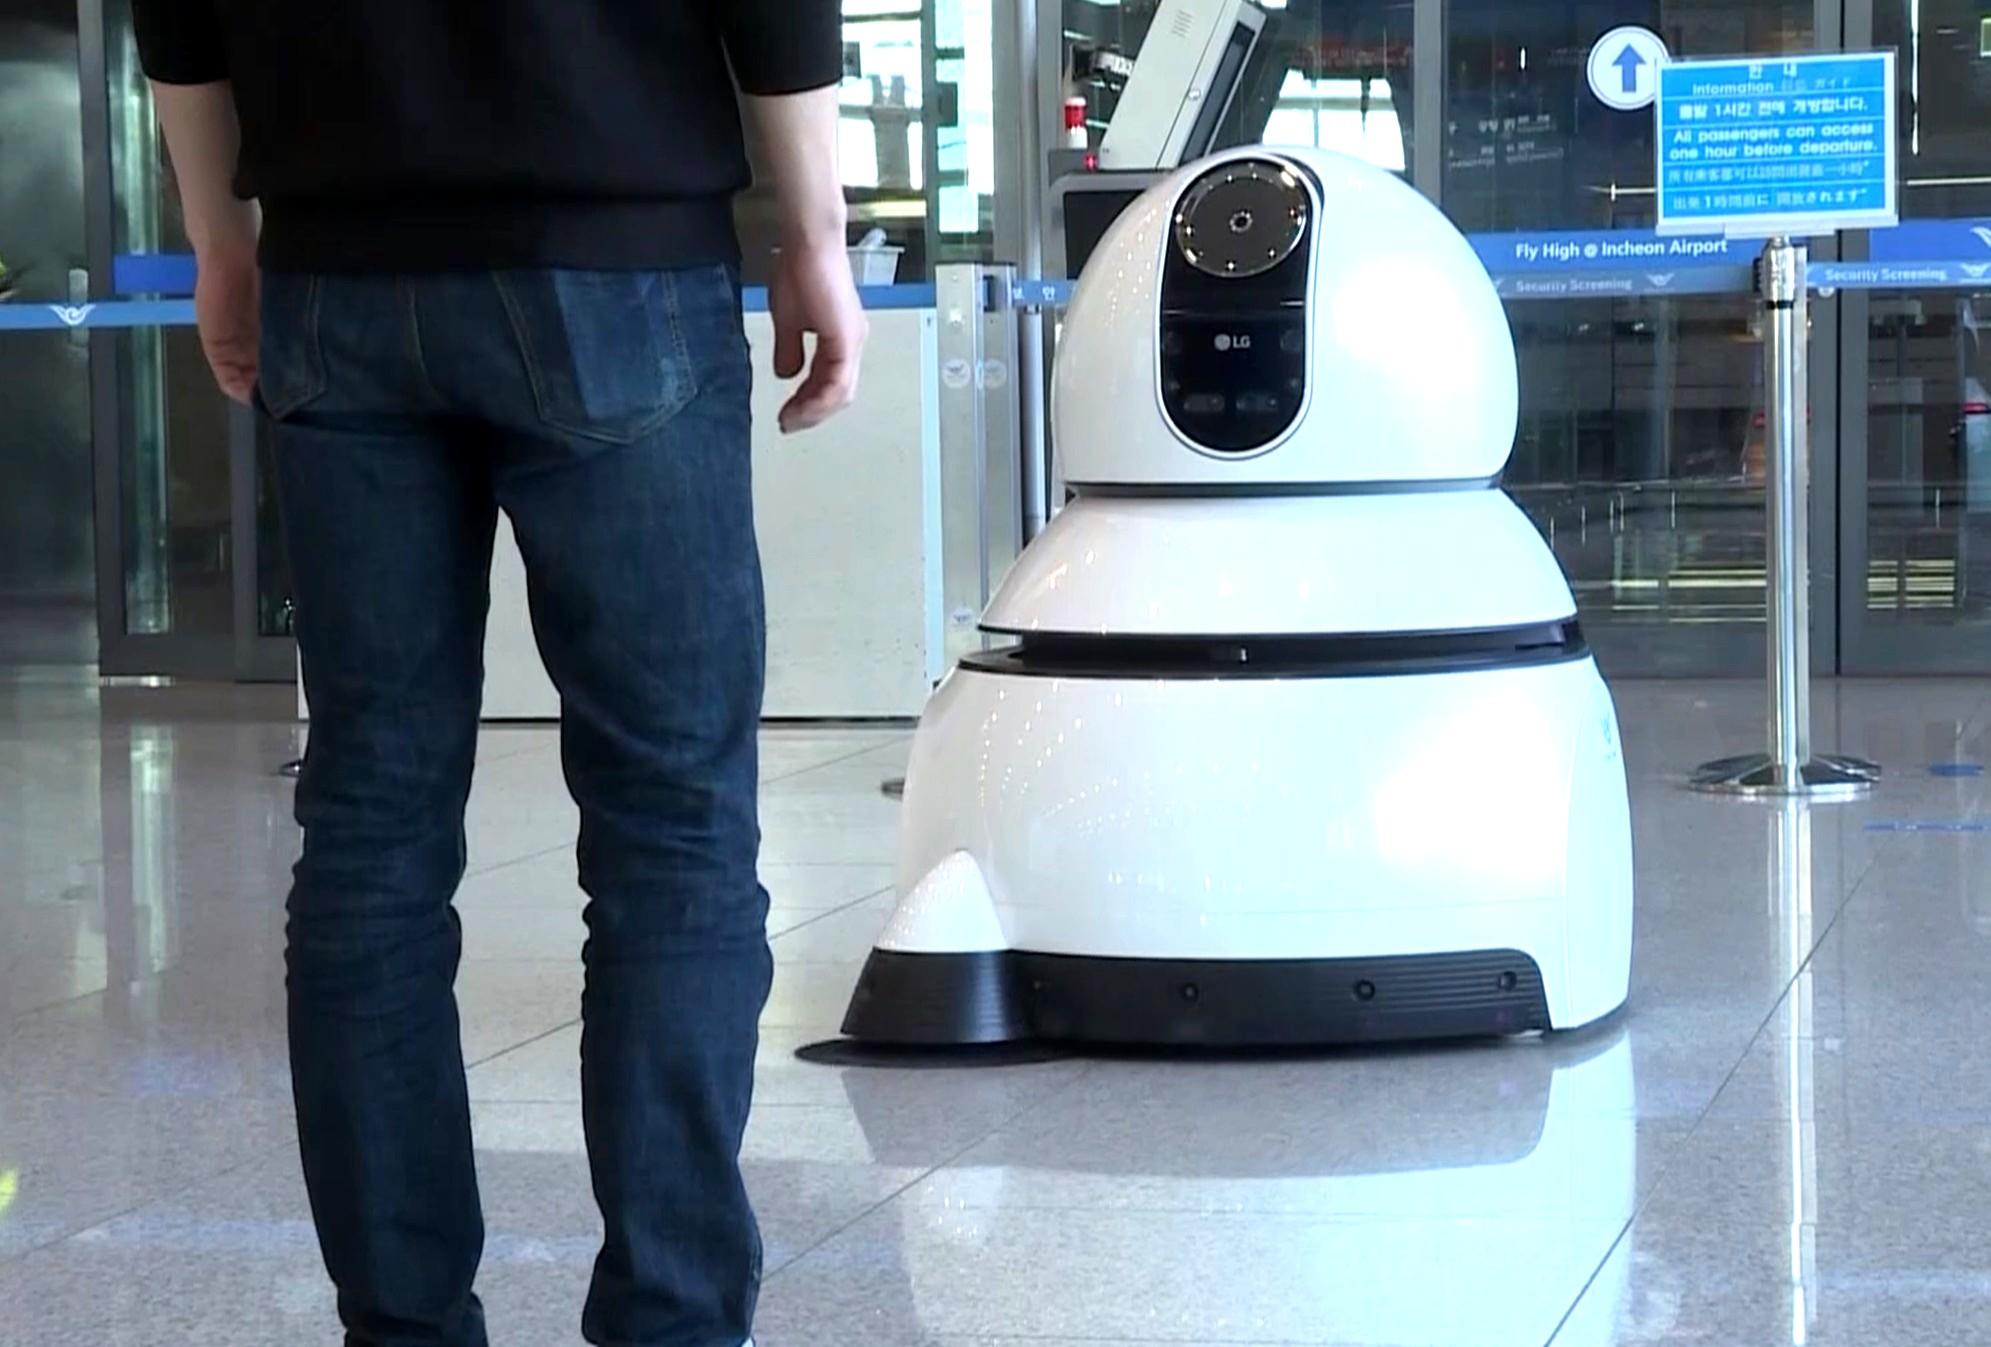 vacuuming robot from LG